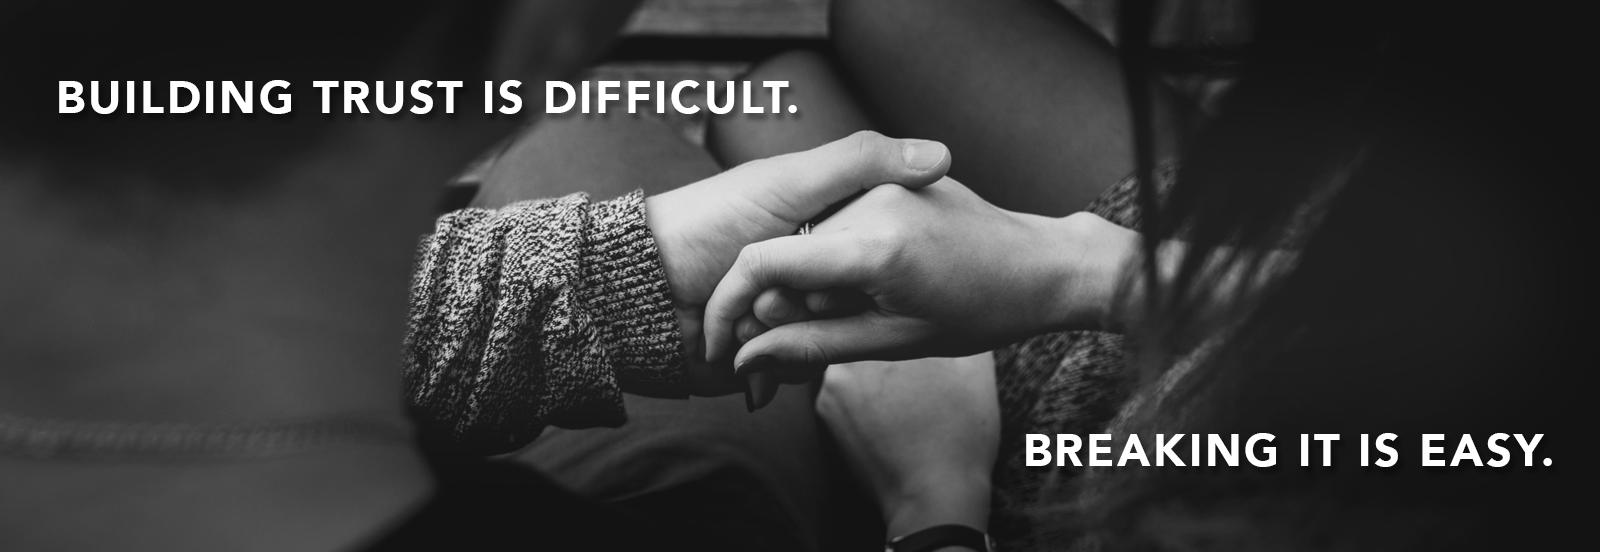 Building Trust is Harder than Breaking it